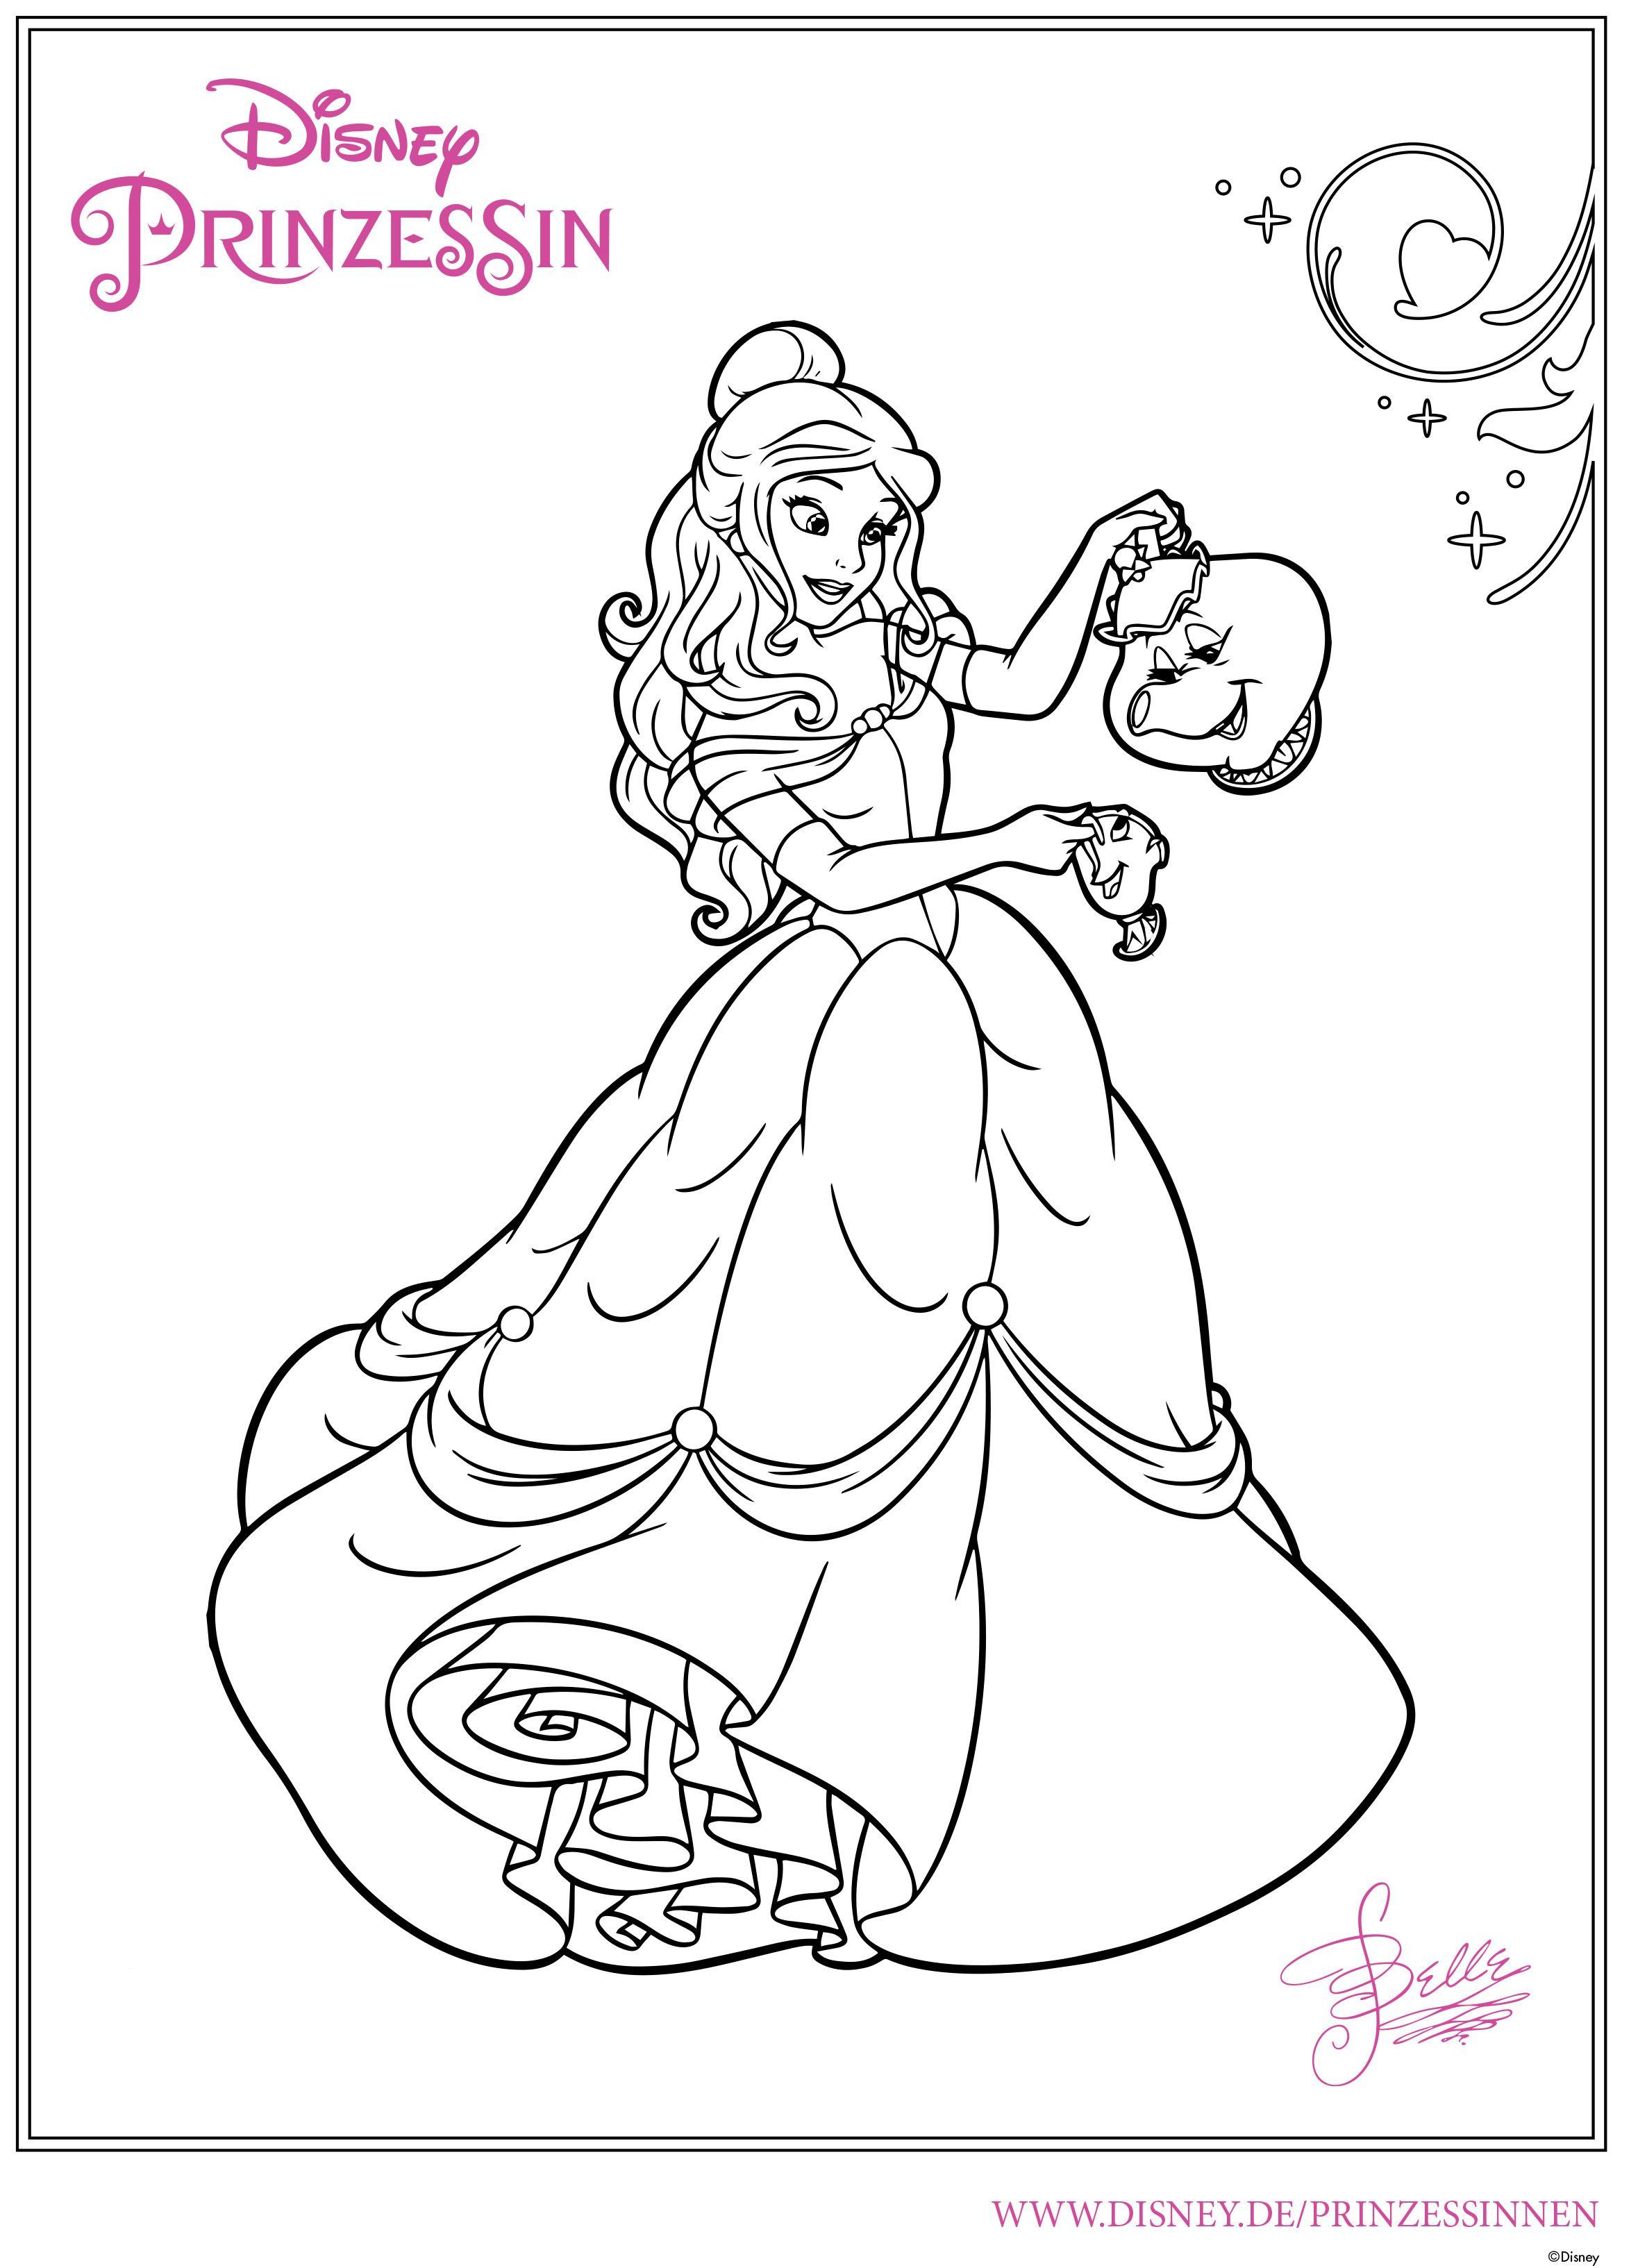 Ausmalbilder Belle 9  Ausmalbilder, Disney malvorlagen